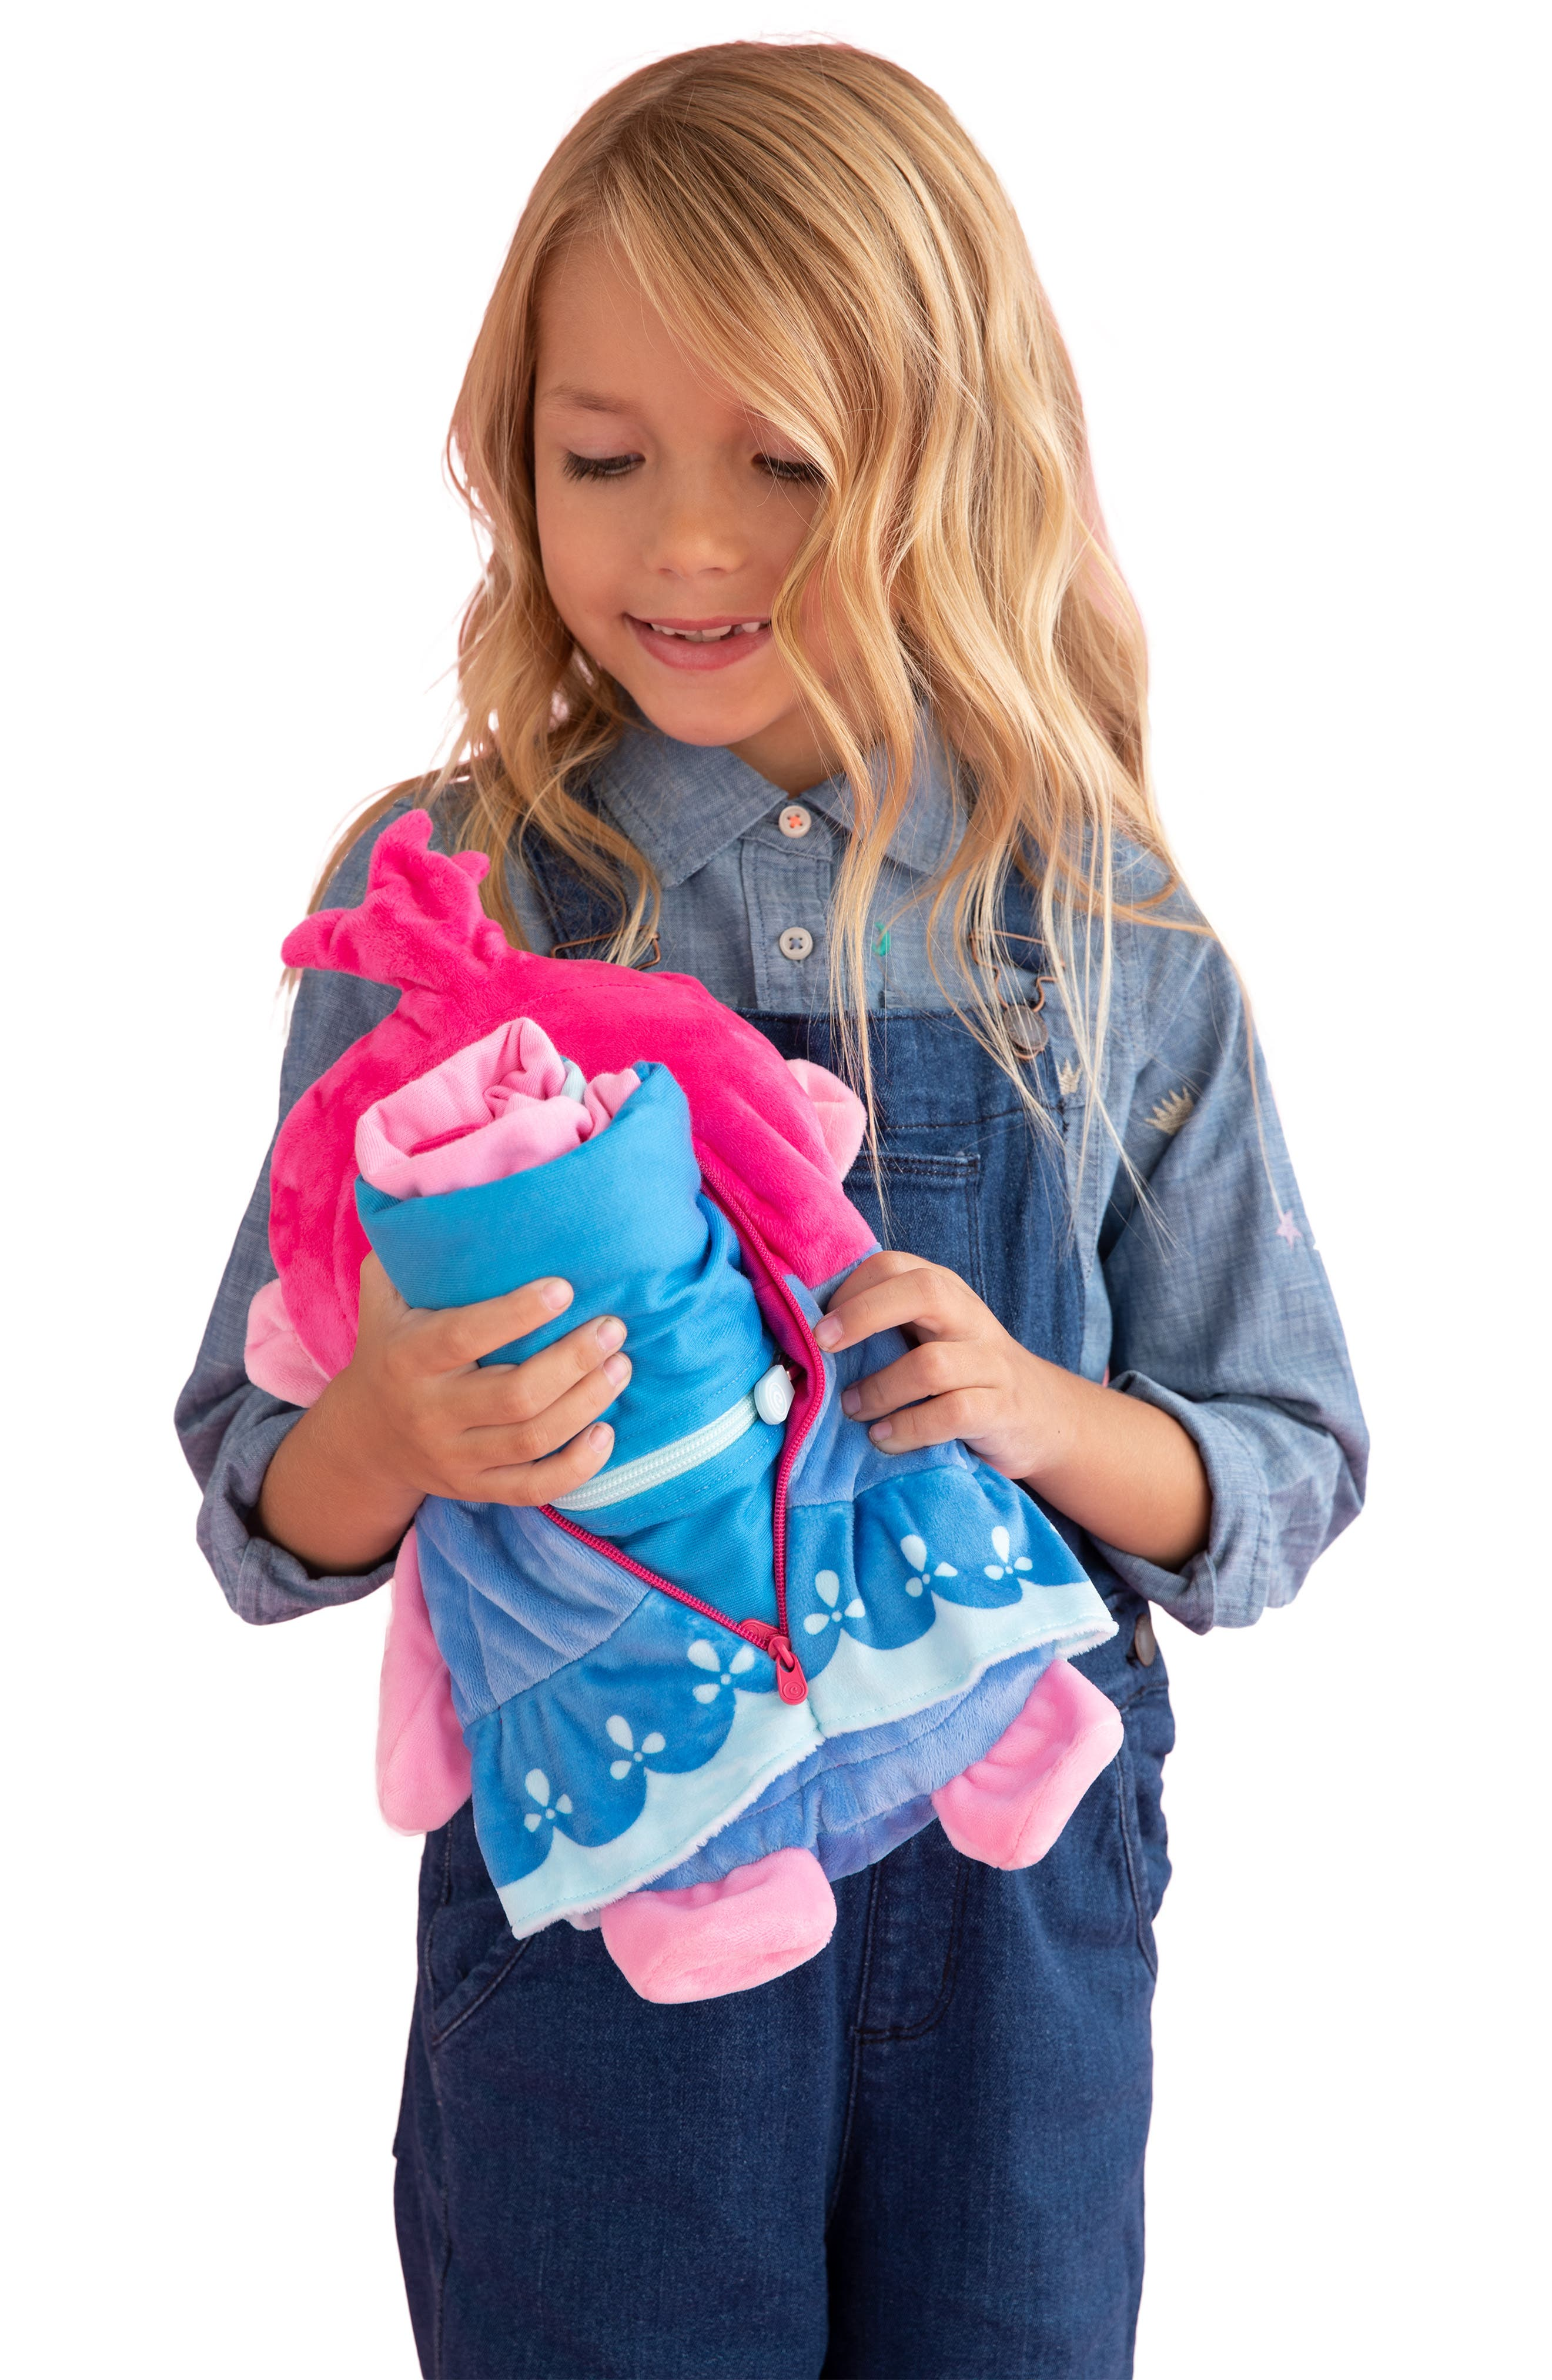 DreamWorks Trolls Poppy 2-in-1 Stuffed Animal Hoodie,                             Alternate thumbnail 10, color,                             PINK MIX